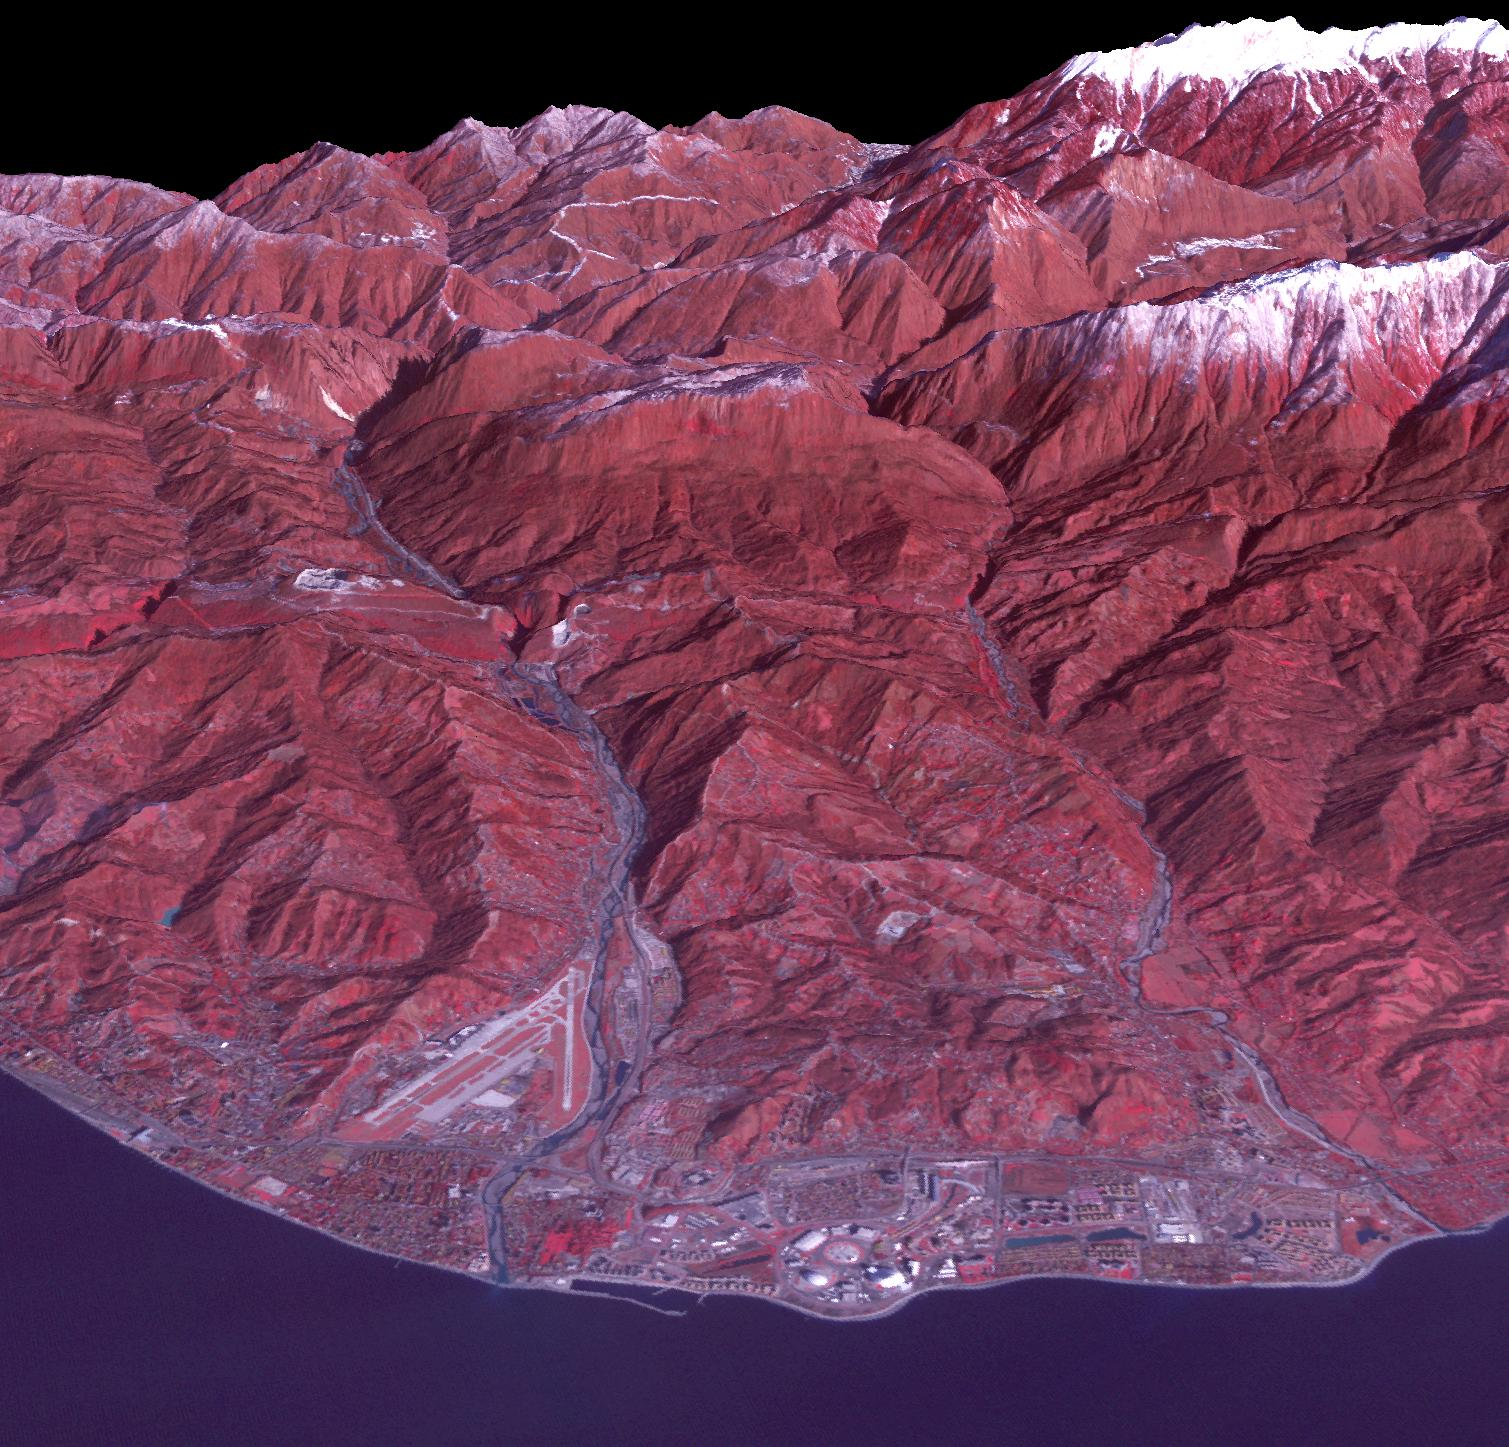 Sochi, Russia Winter Olympic Sites (Coastal Cluster)